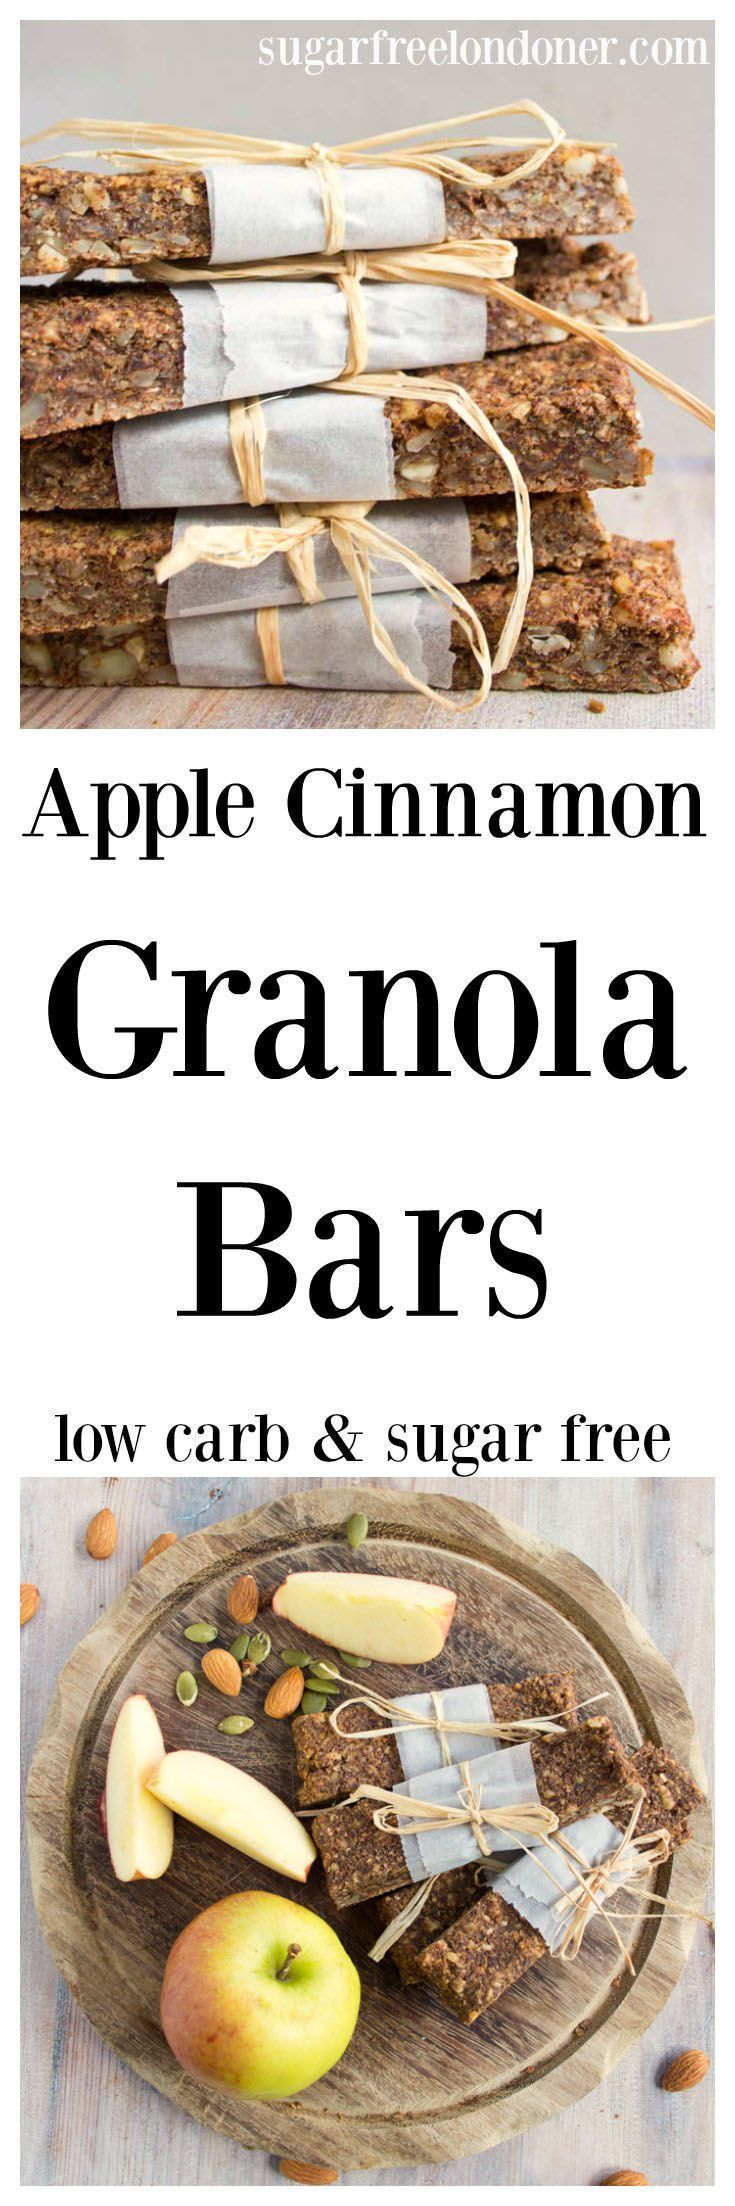 Blue apron low carb - Apple Cinnamon Granola Bars Low Carb And Sugar Free